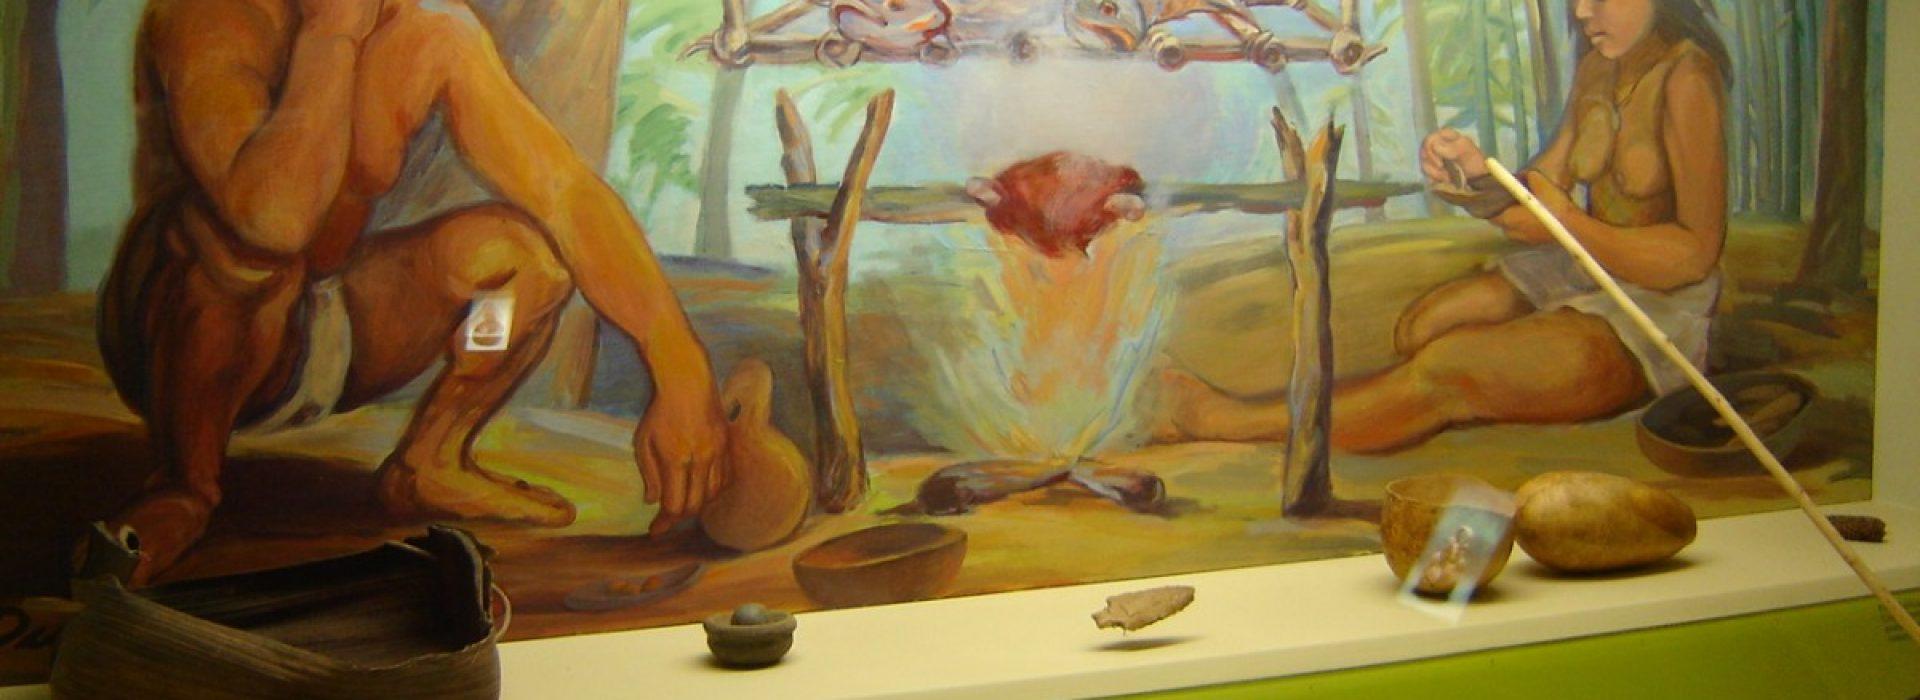 dibujo_museo_del_oro_cazadores-1200x518